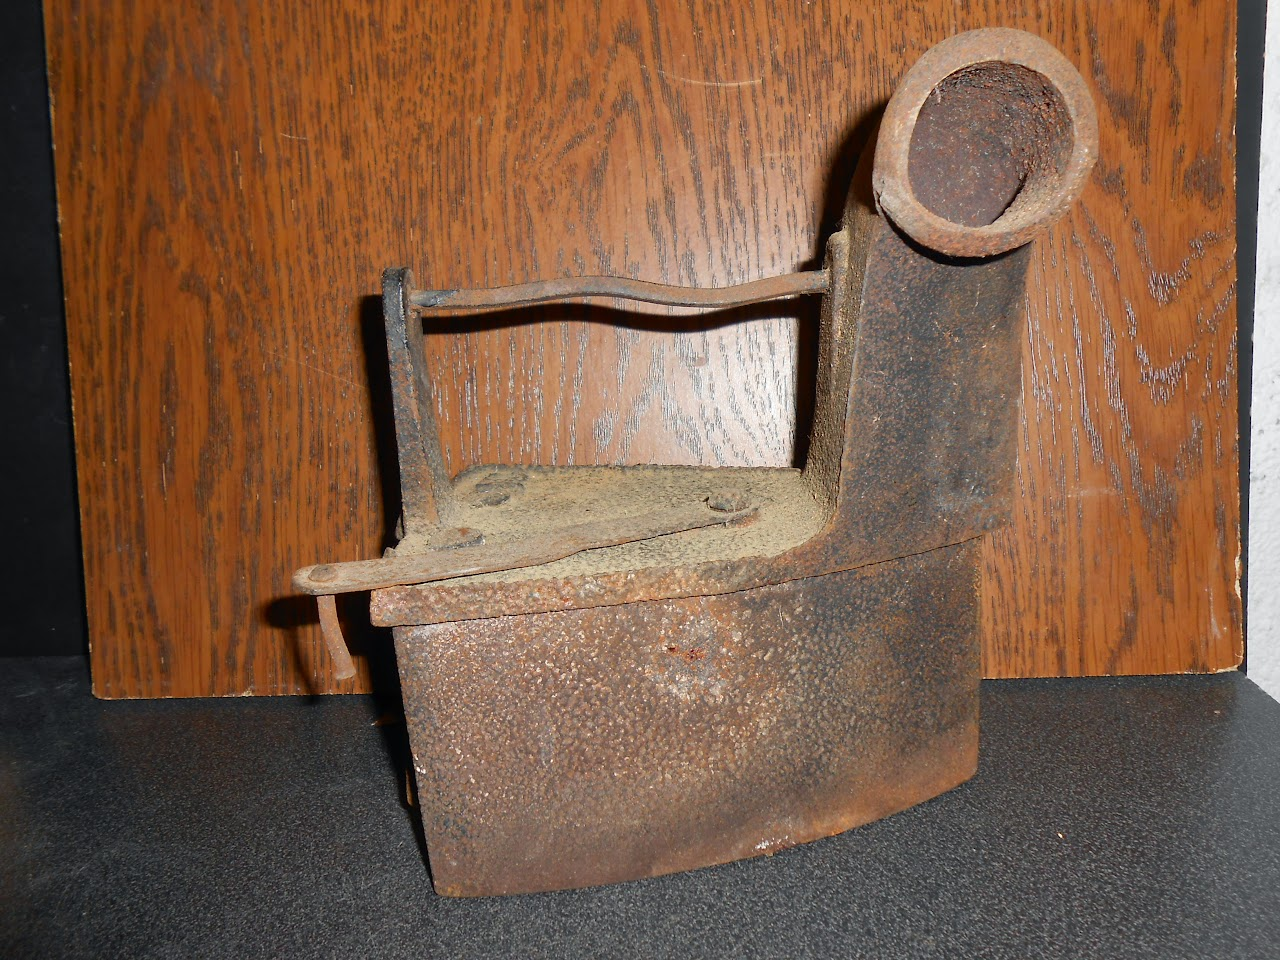 ancien fer a repasser 2 385 kilo collection metal objet decoration repassage 19e ebay. Black Bedroom Furniture Sets. Home Design Ideas